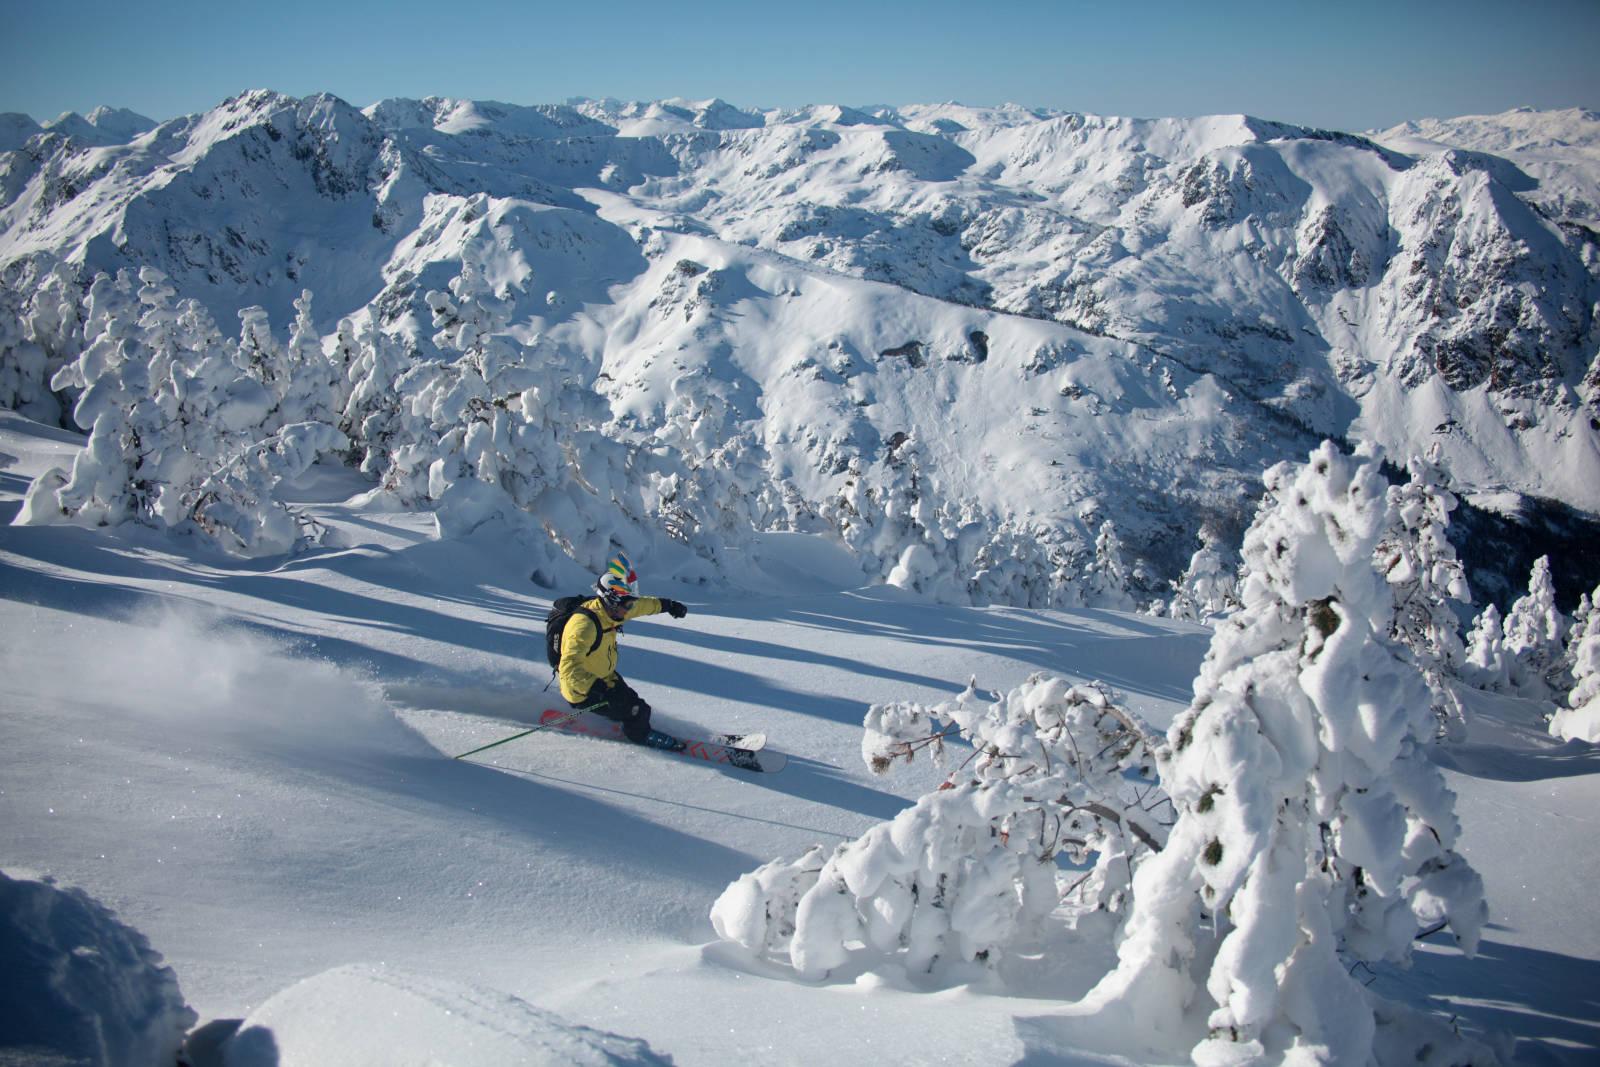 stations de ski des pyrenées Freeride station